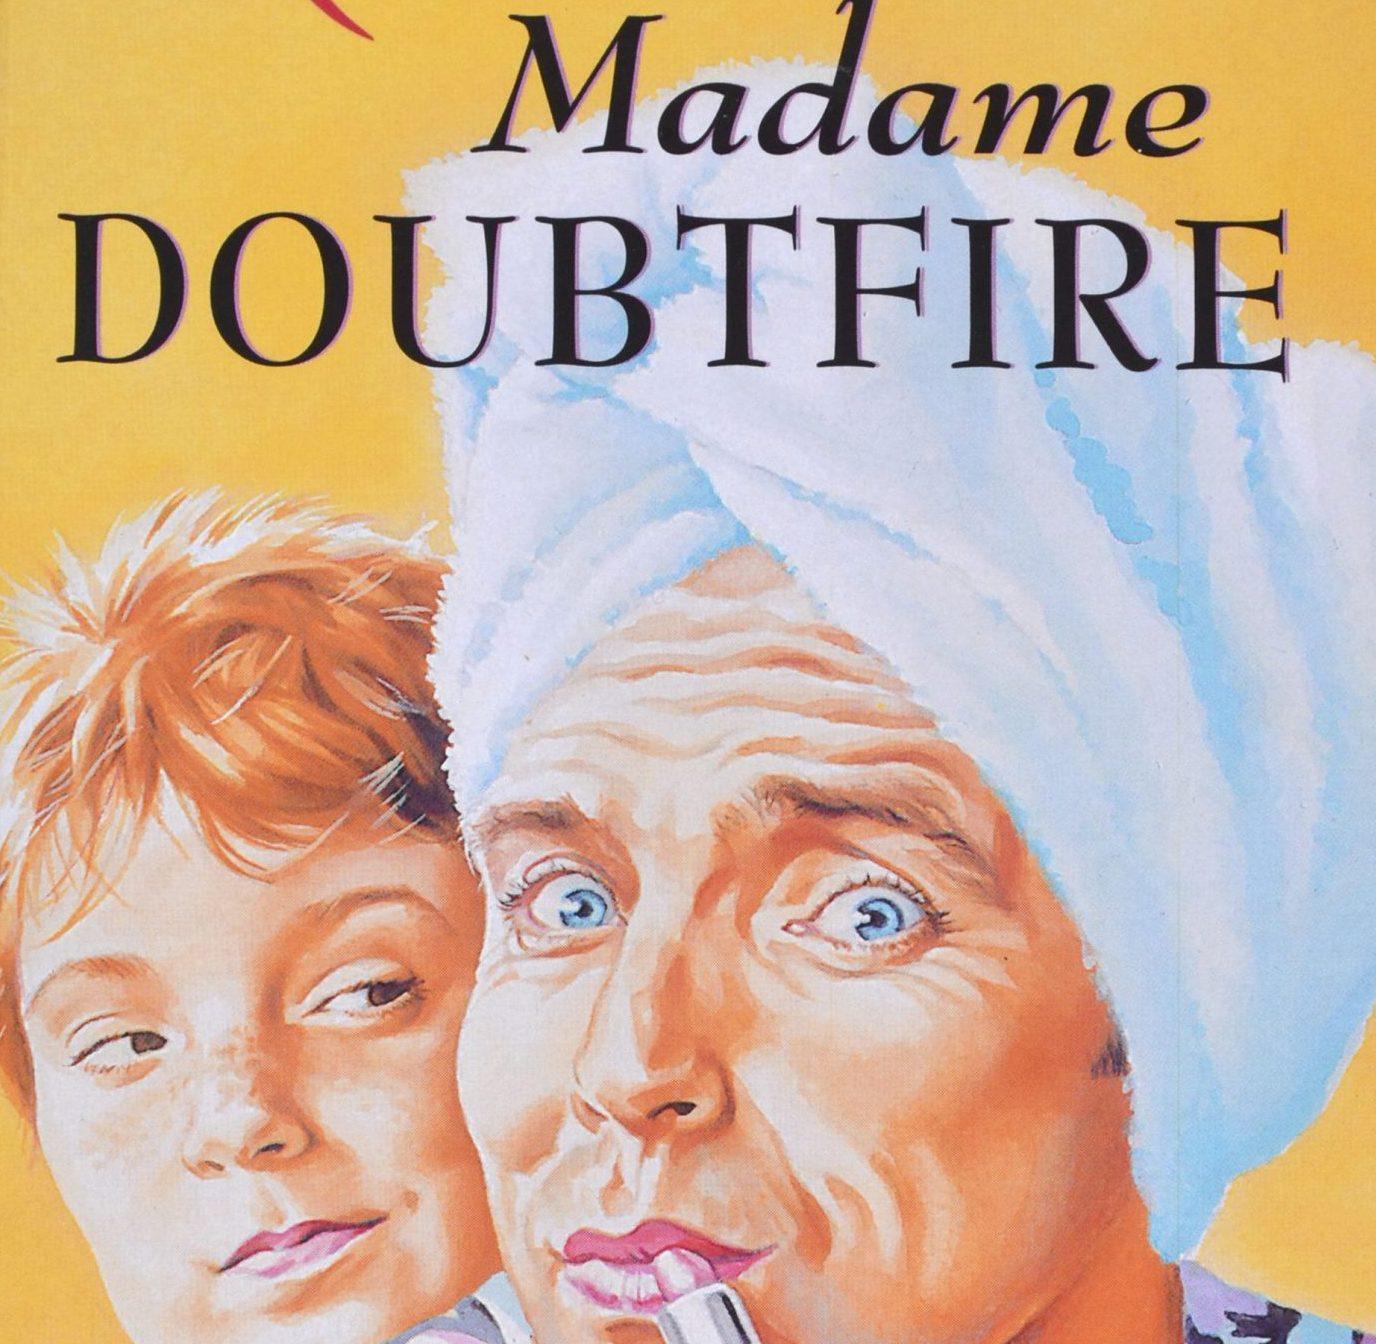 6cfb0e5e11f756b3dbf2831c385959f2 scaled e1625236048597 25 Things You Never Knew About Mrs. Doubtfire